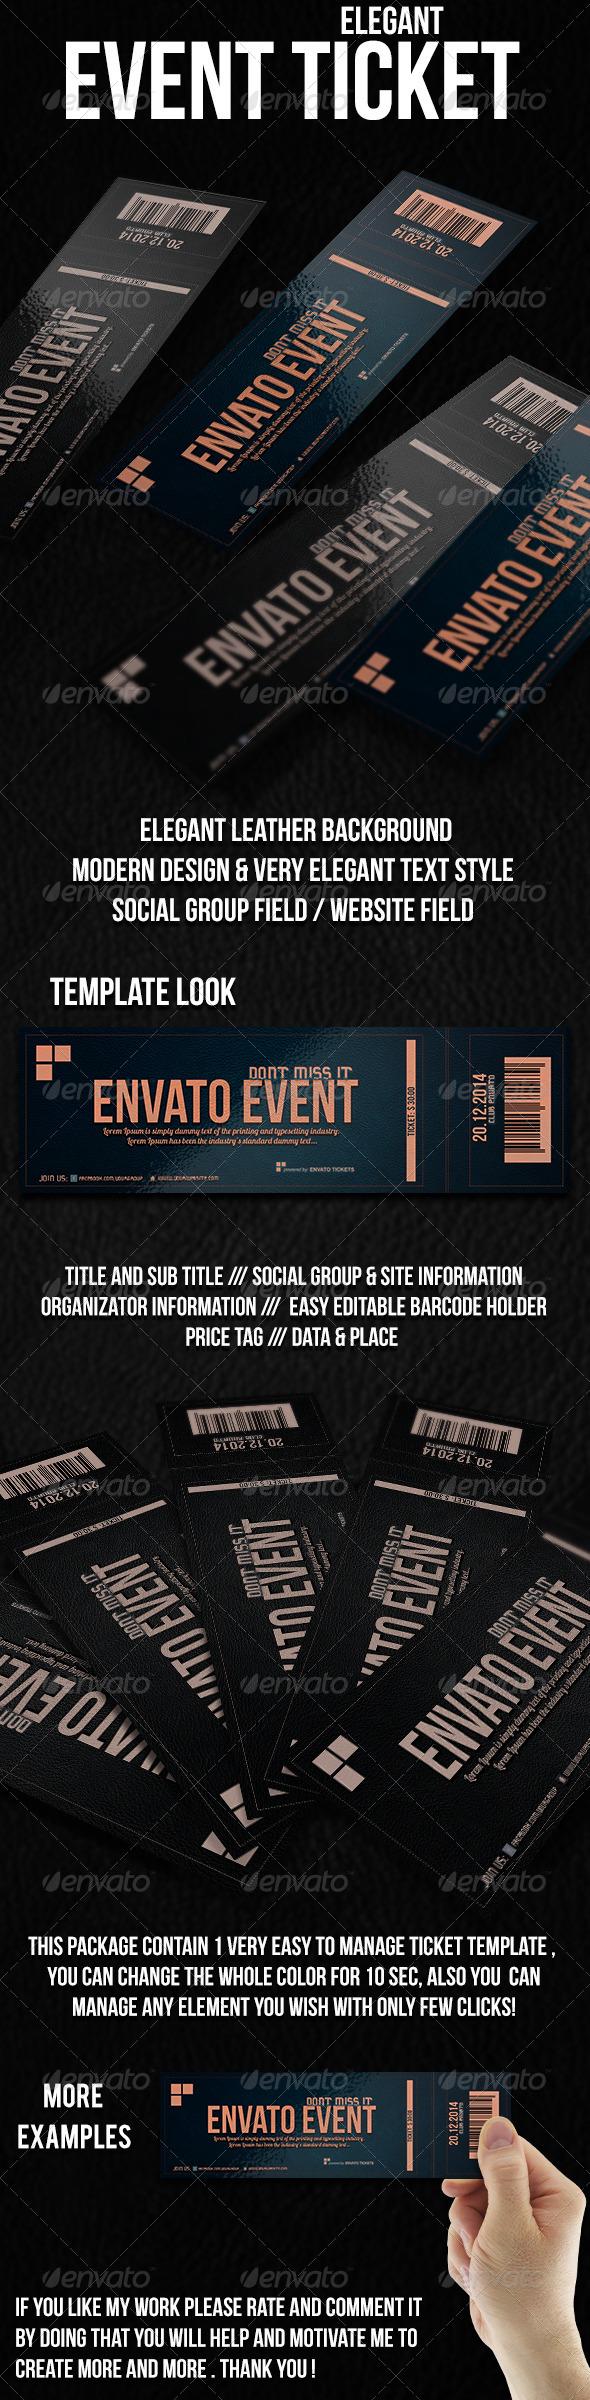 Elegant Ticket Template - Cards & Invites Print Templates